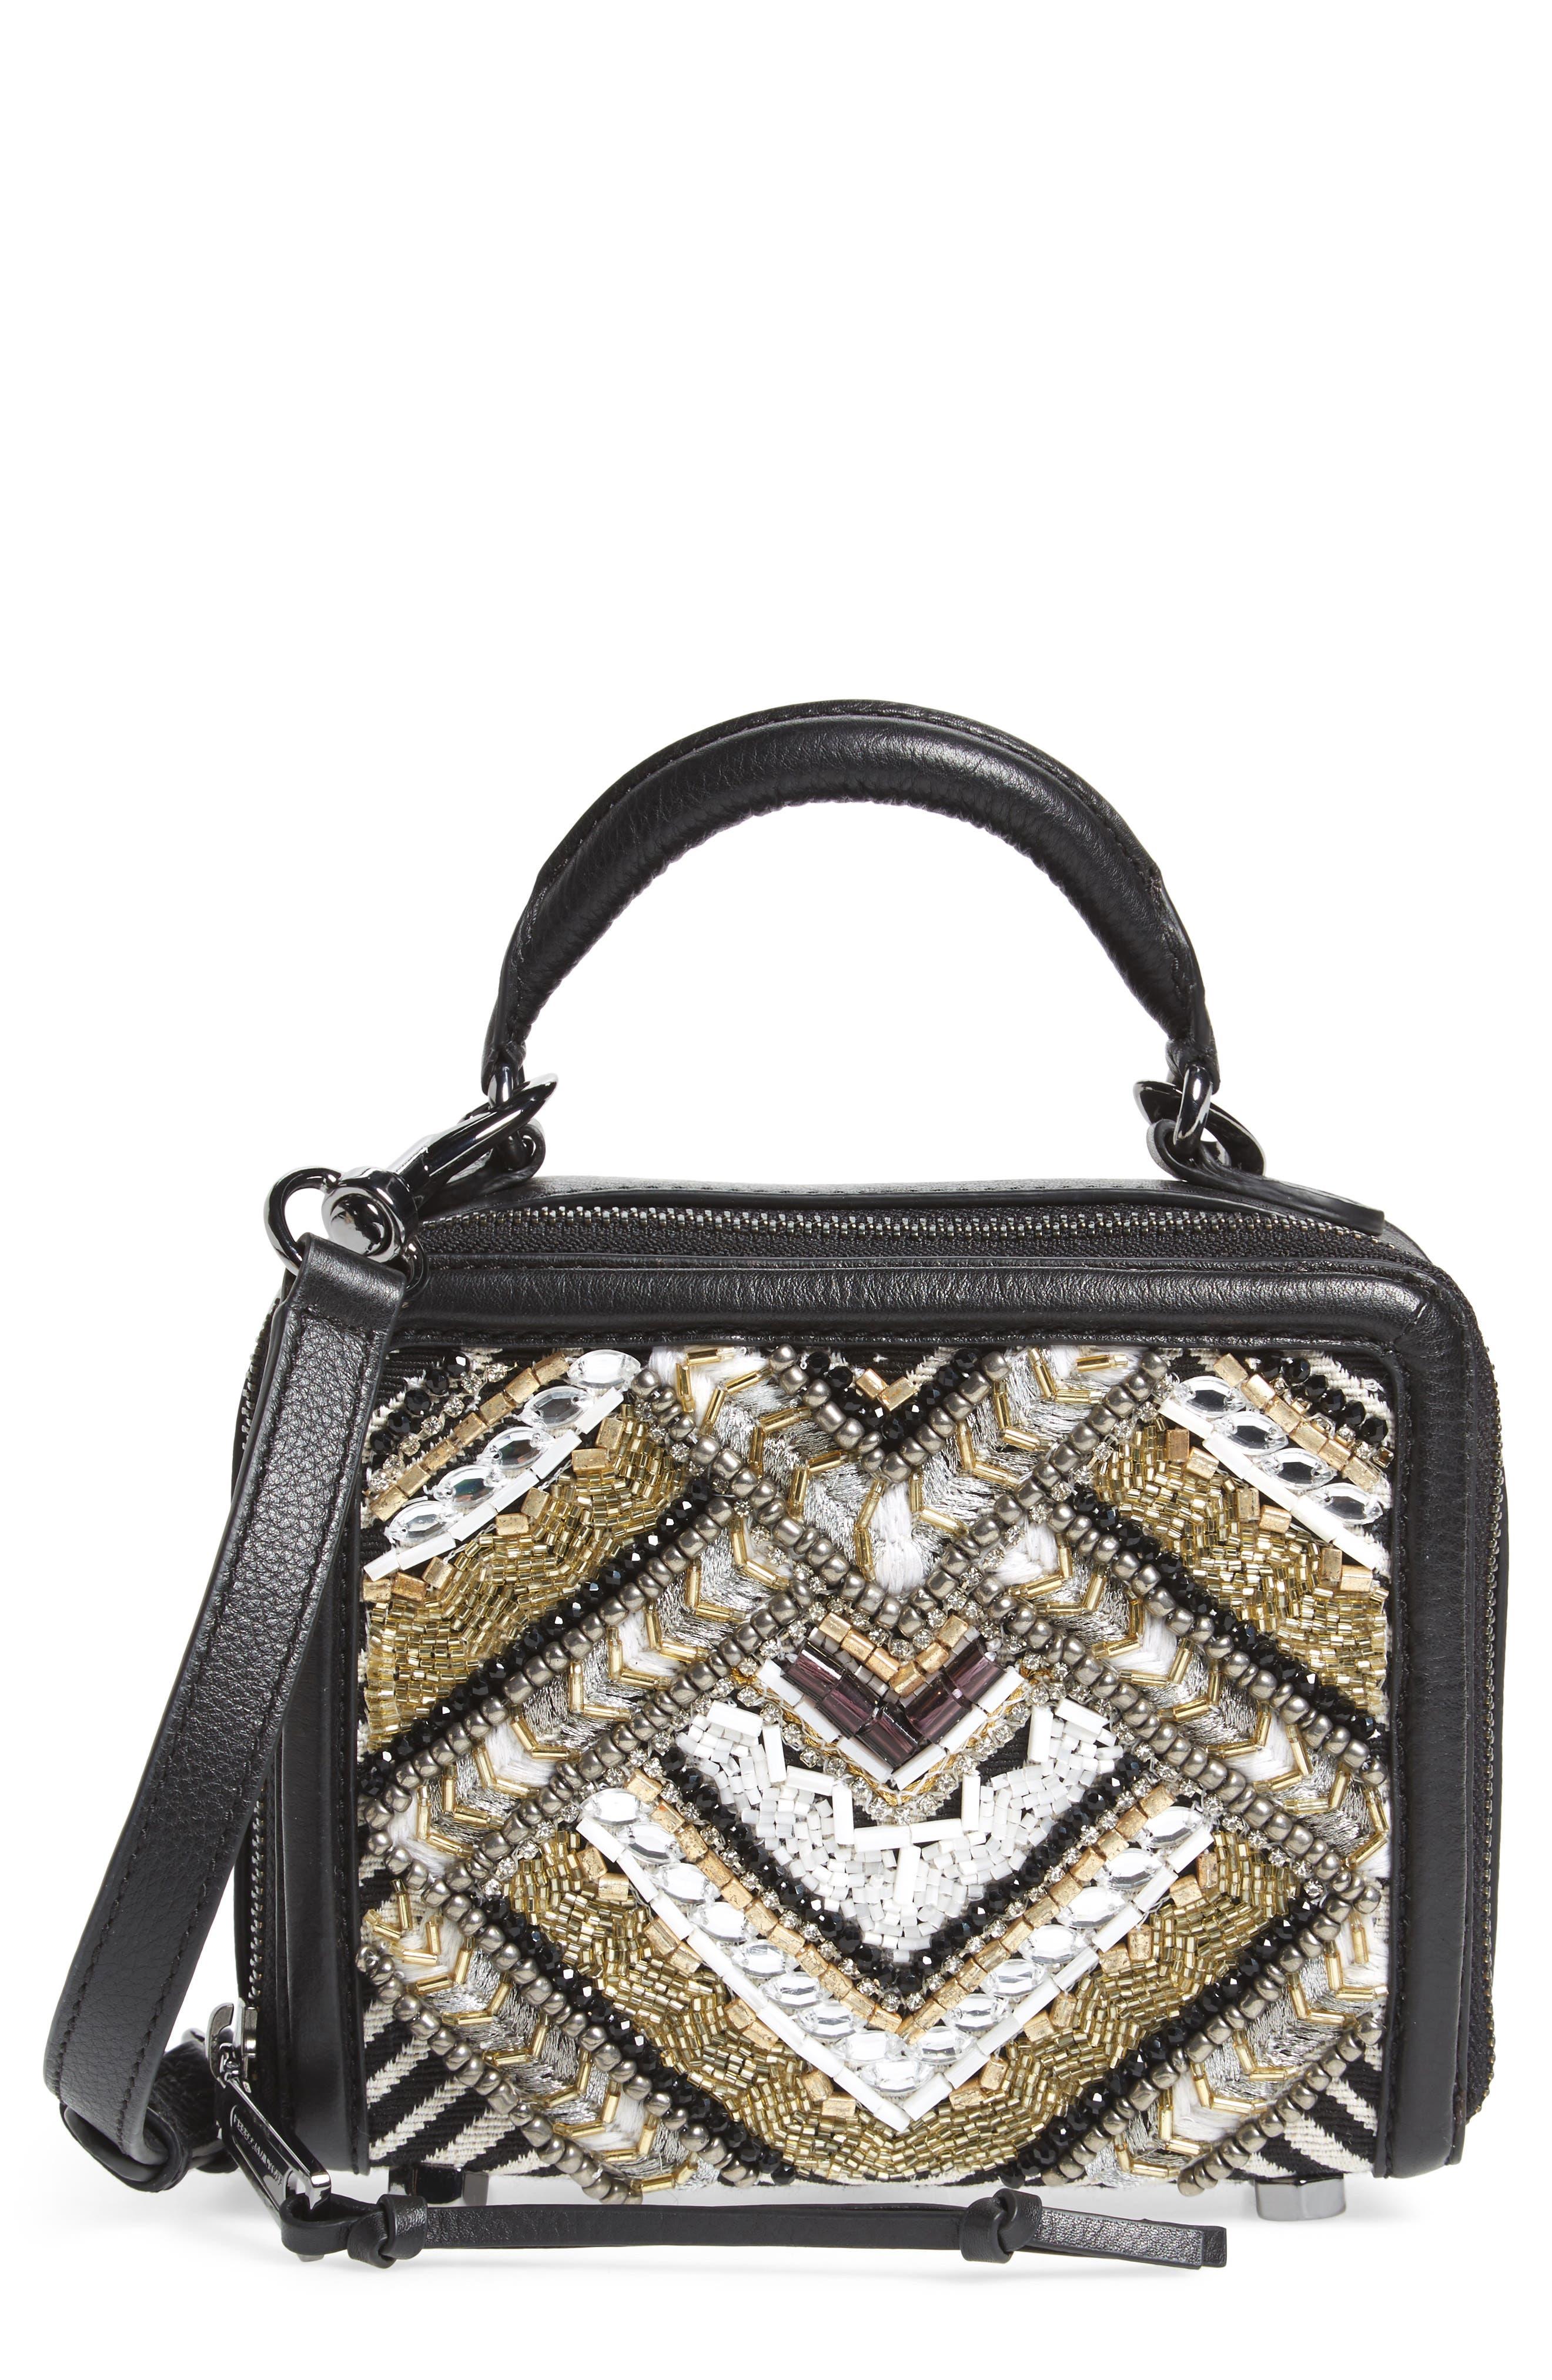 Wonder Box Embellished Crossbody Bag,                             Main thumbnail 1, color,                             Black Metallic Multi